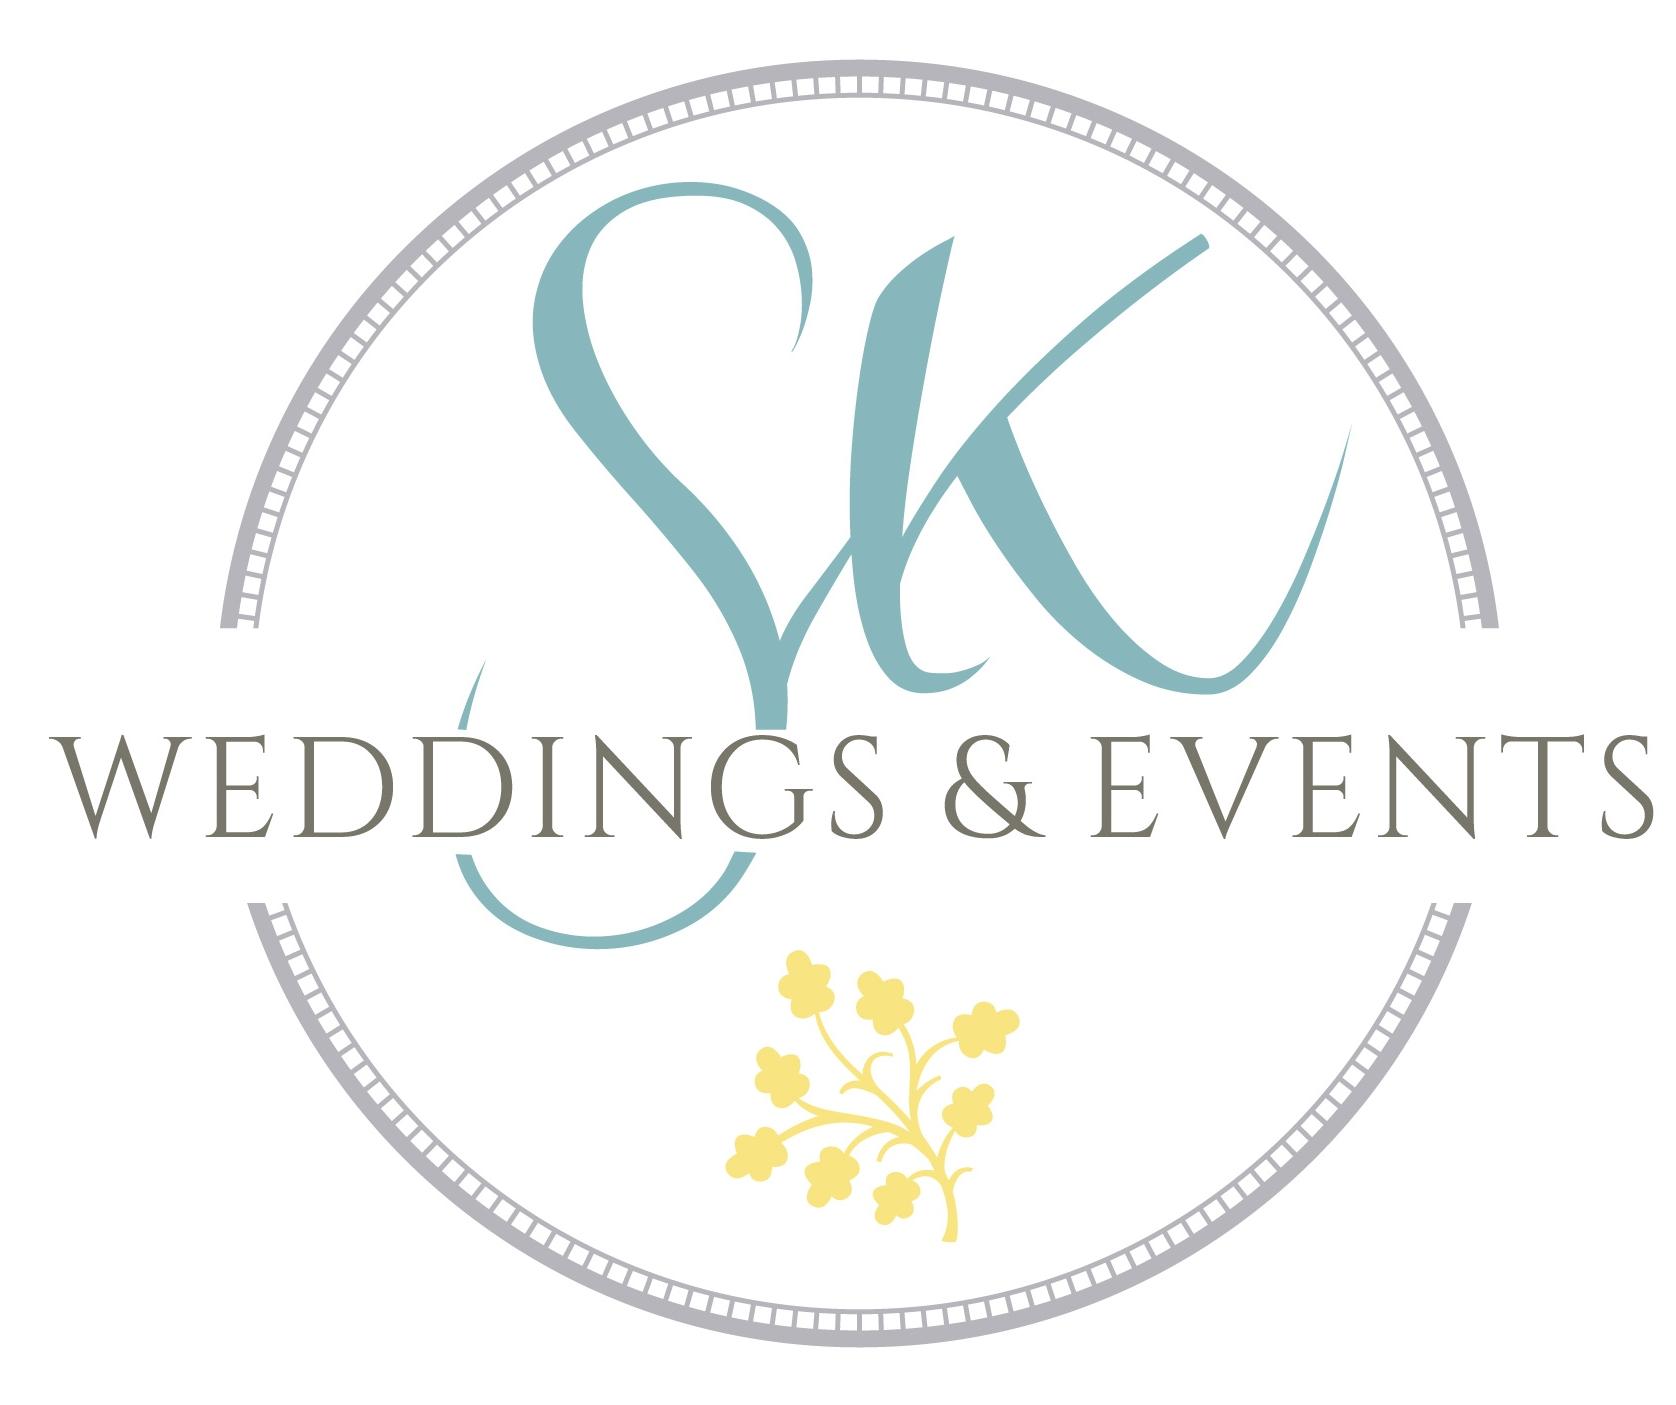 SK-weddings-events